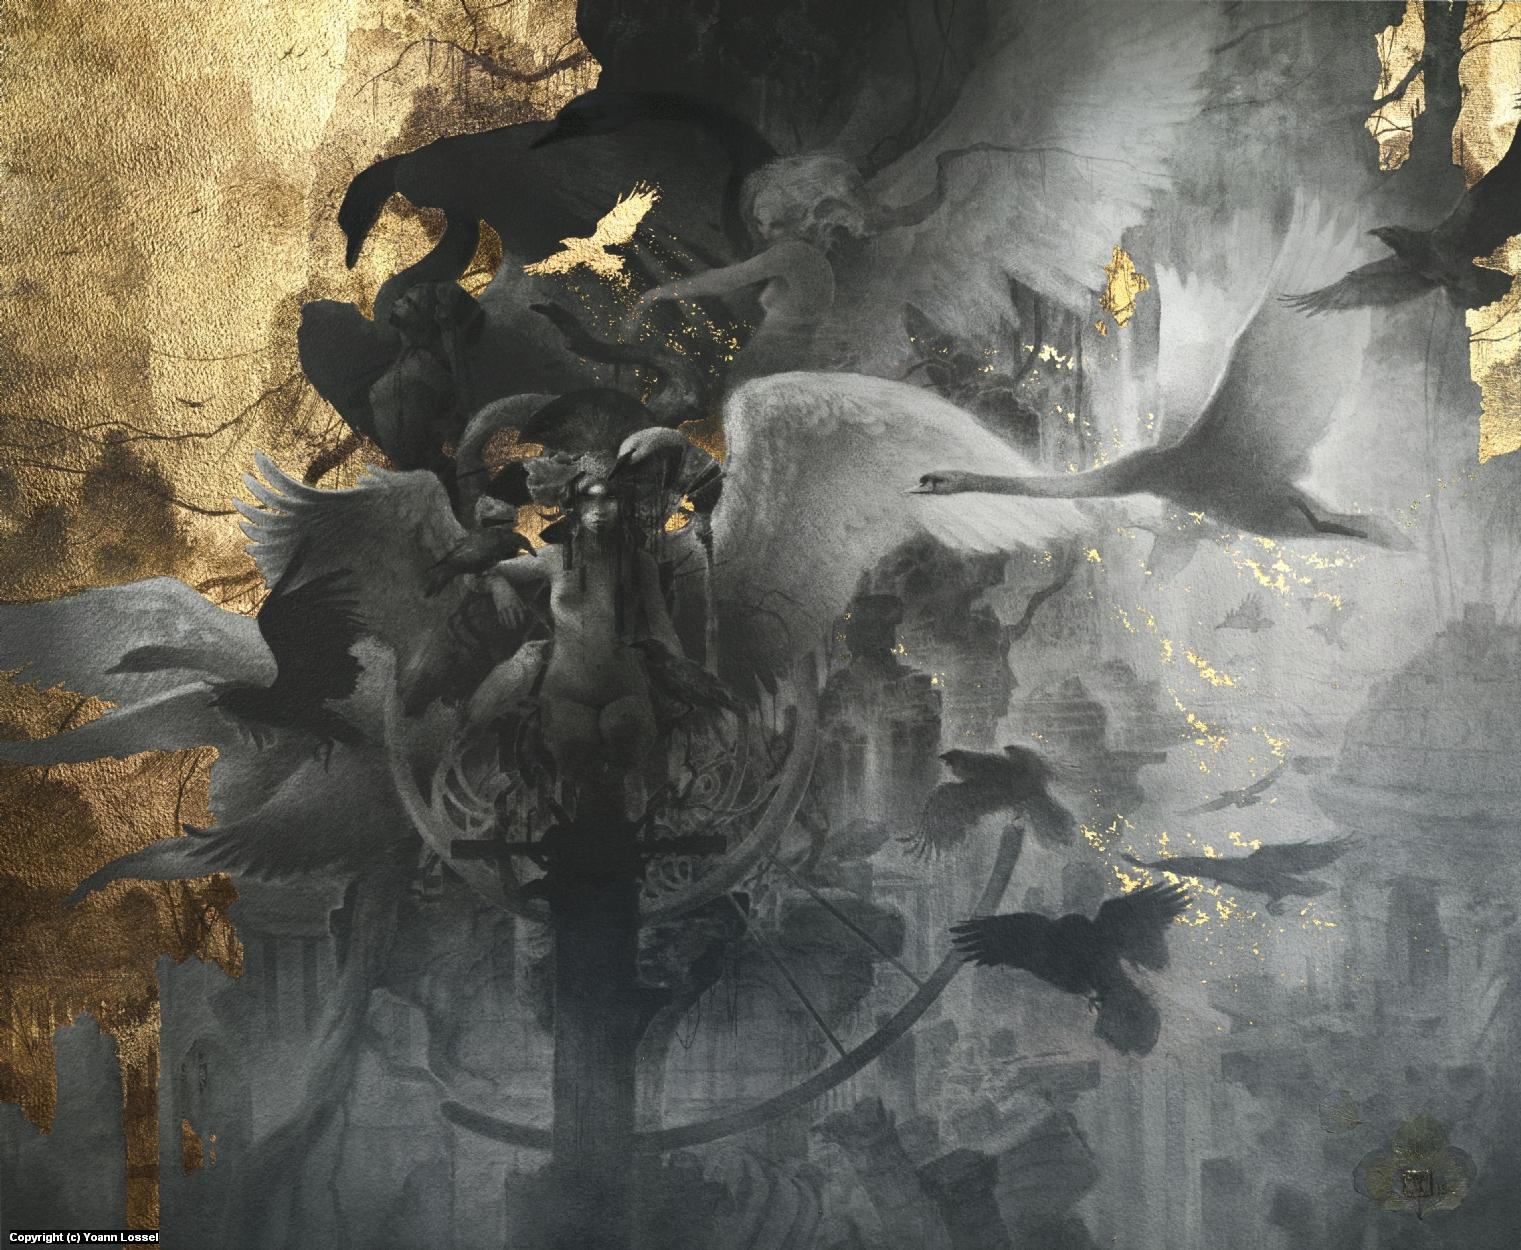 The Fall Artwork by Yoann Lossel